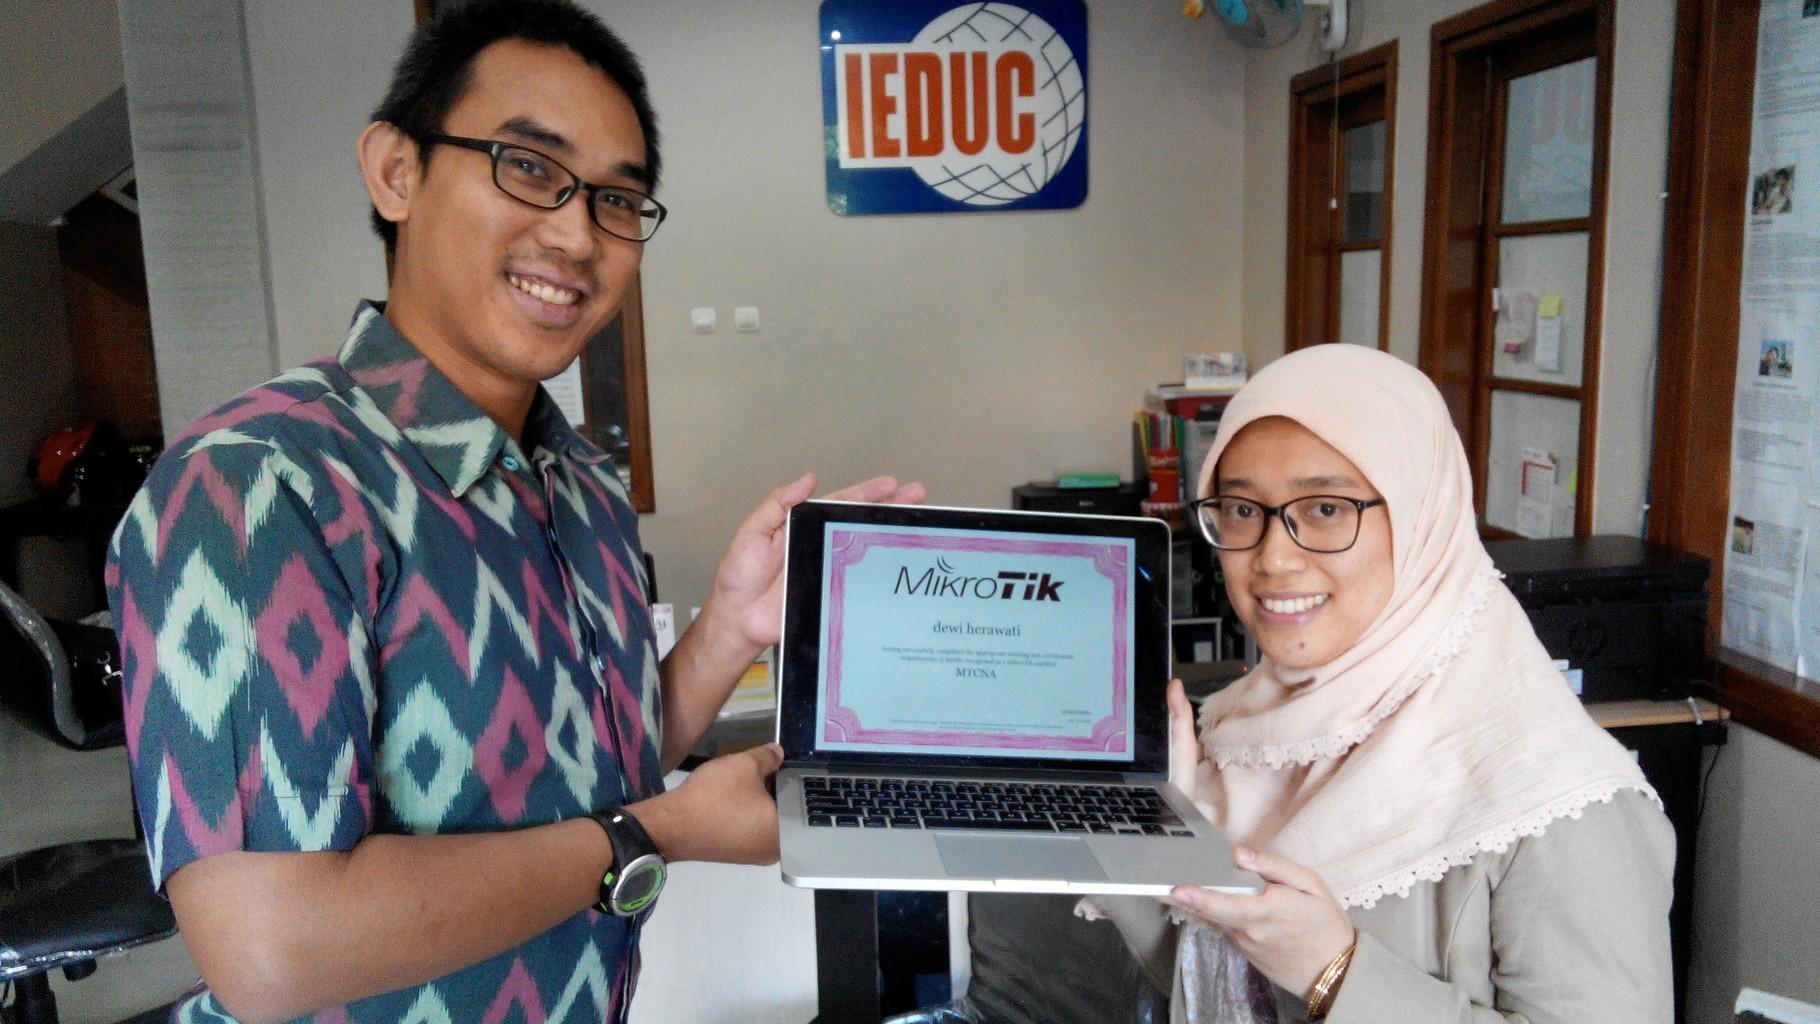 June 2016, MTCNA training, Bandung